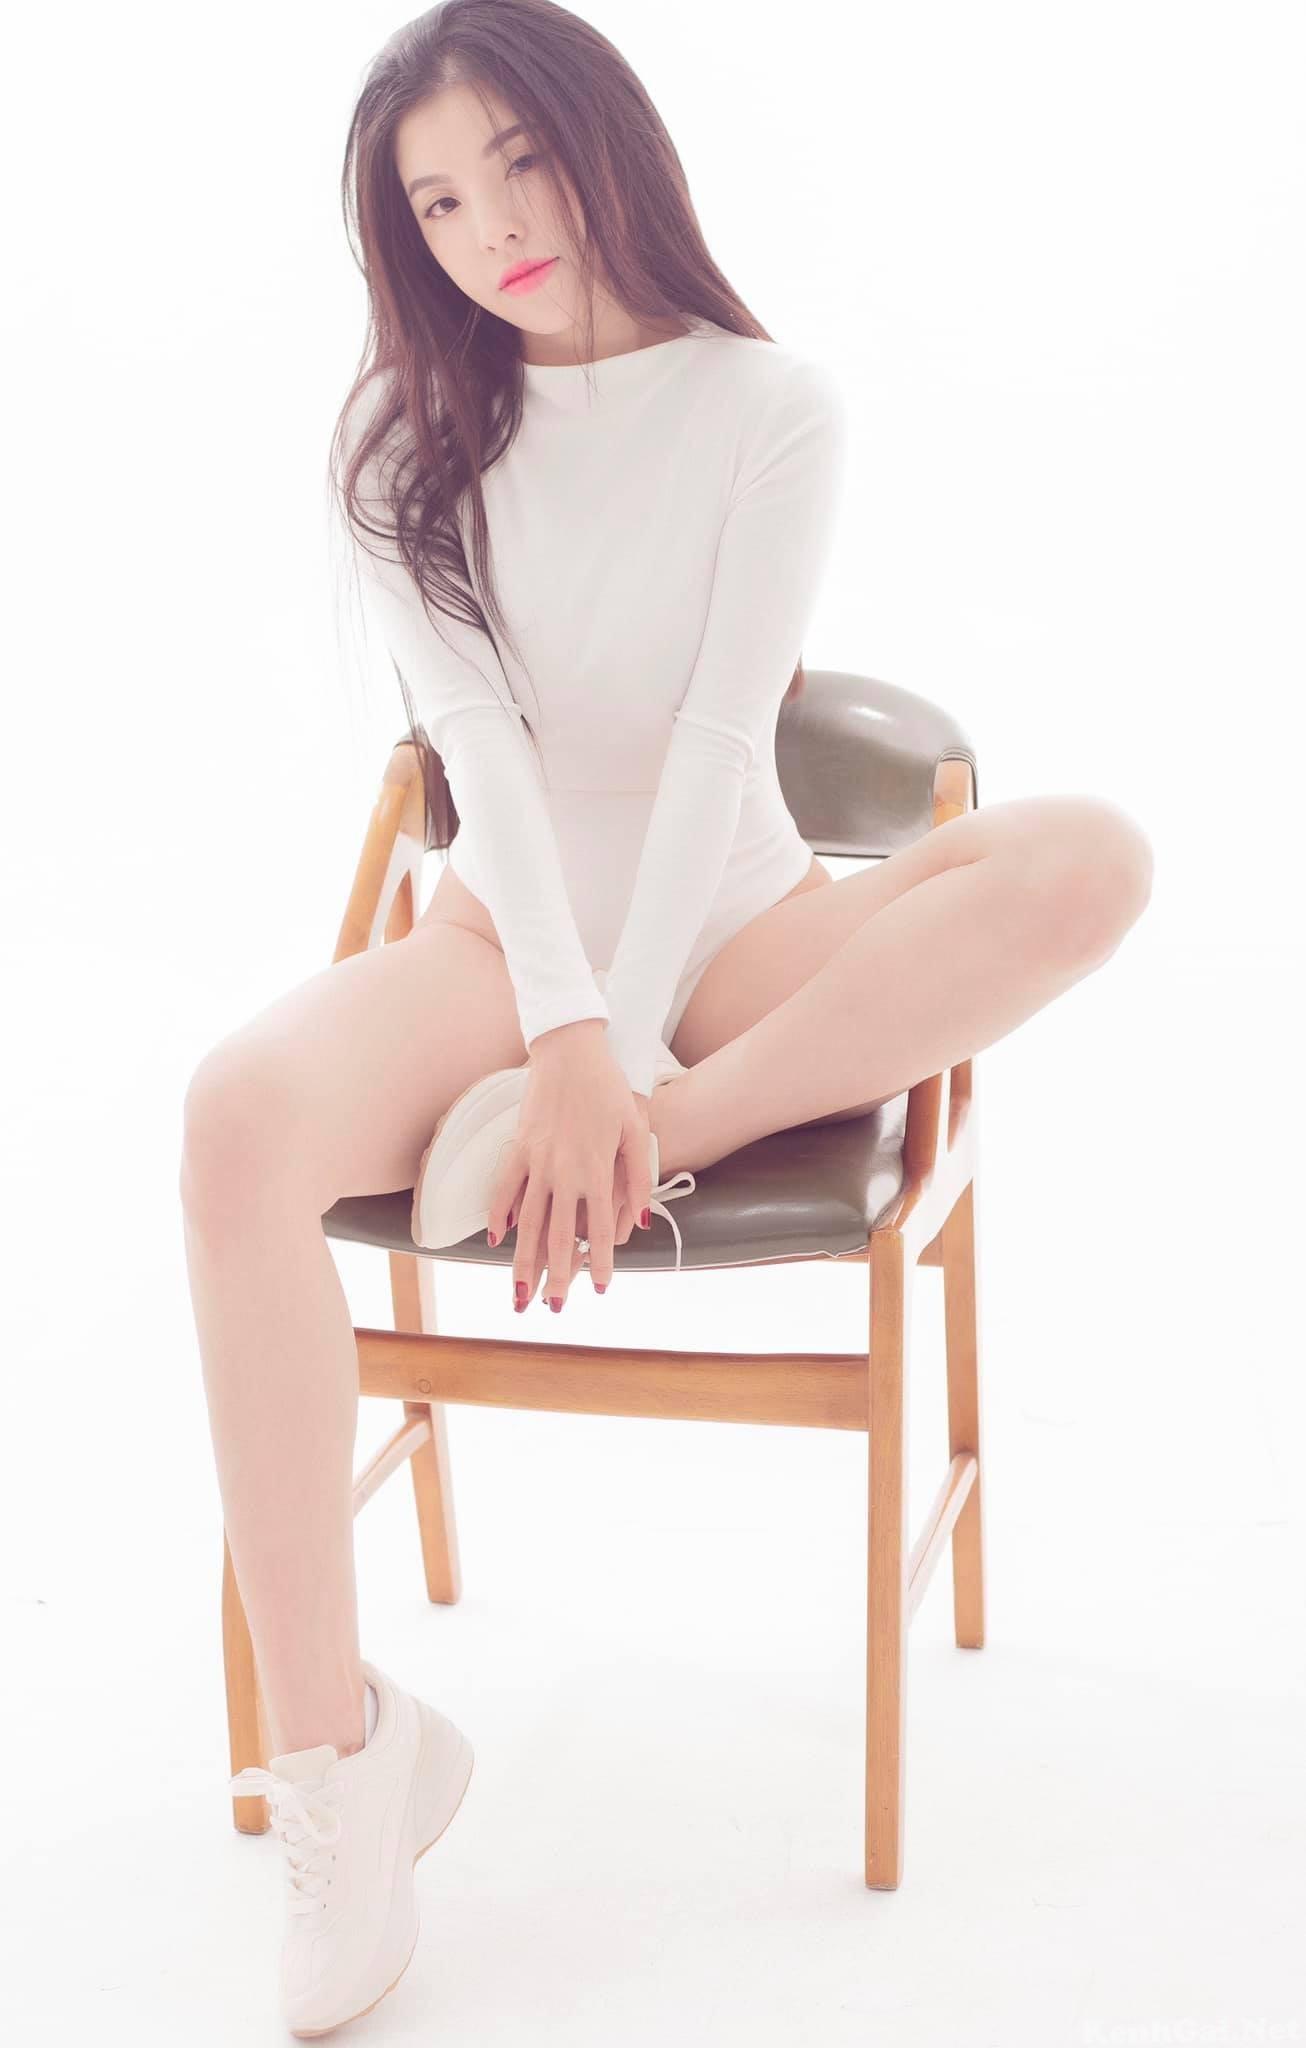 Model Hotgirl Lê Mai   E-CUP